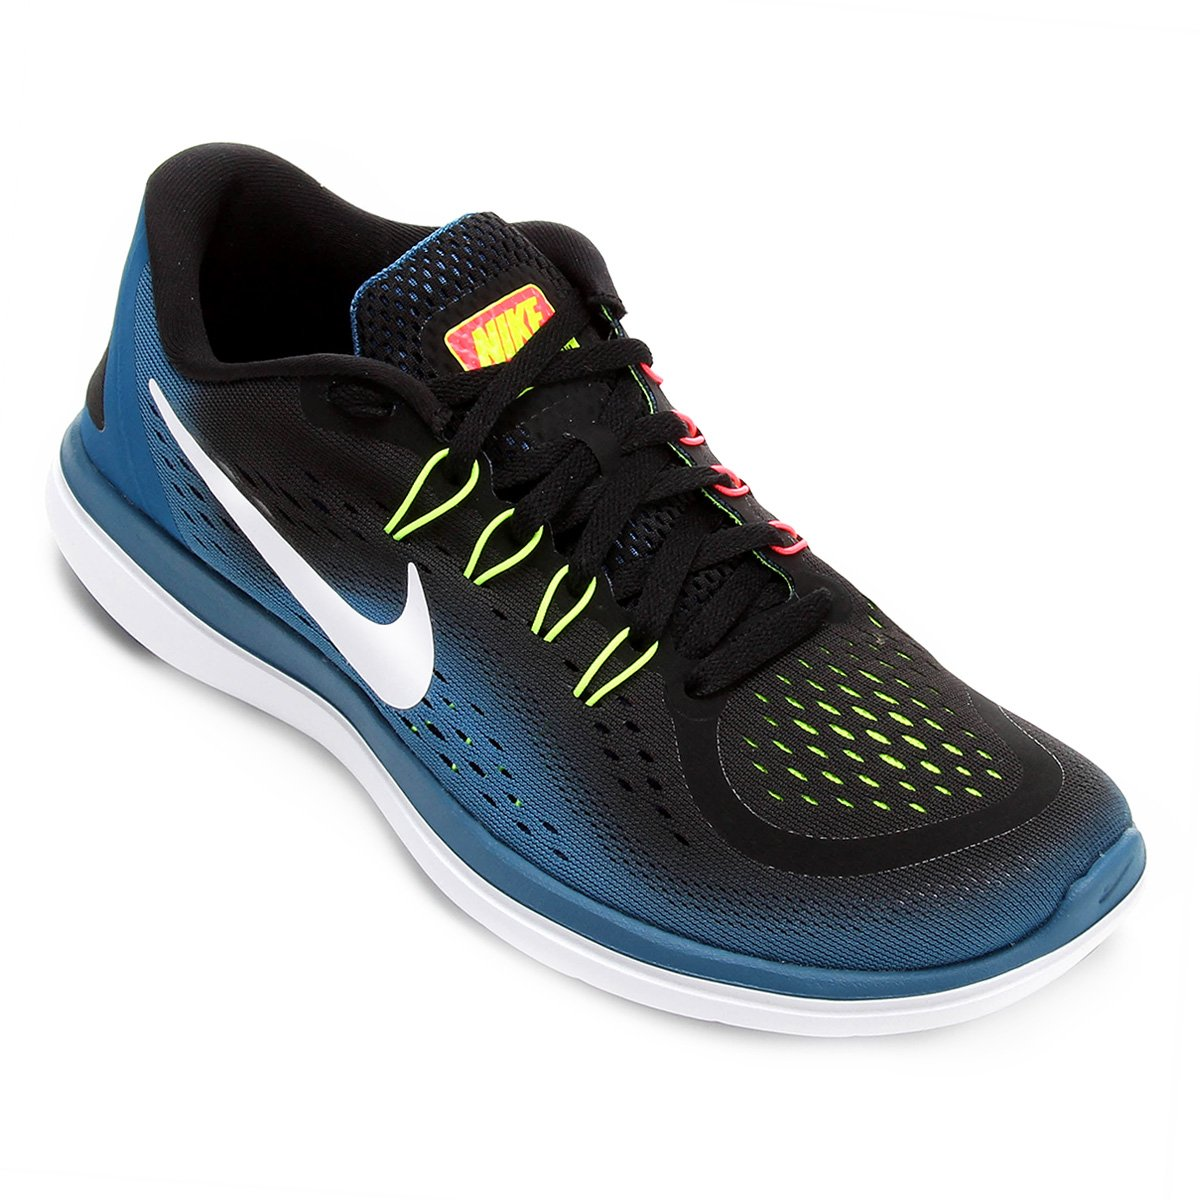 a5ed17d917f Tênis Nike Flex Run Masculino - Preto e Azul - Compre Agora